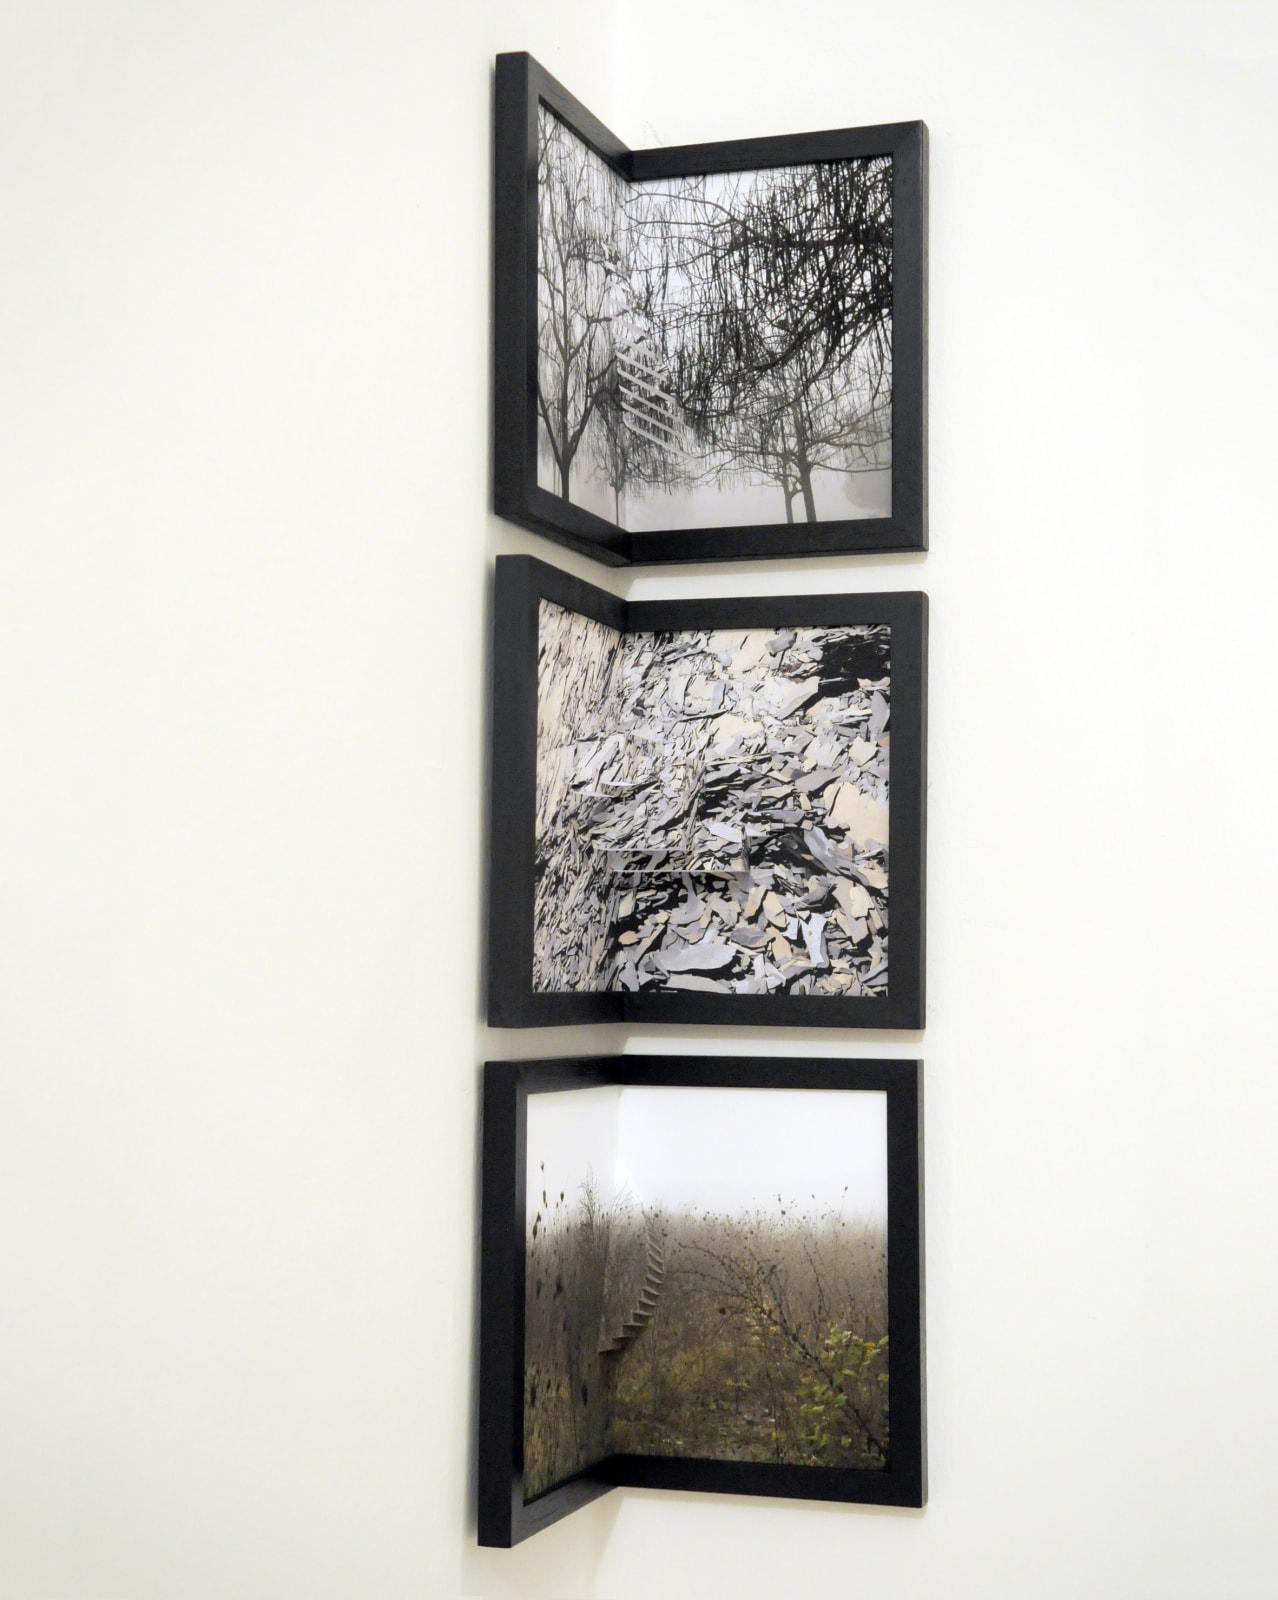 Silvia Camporesi Where all become, 2012 Installation view